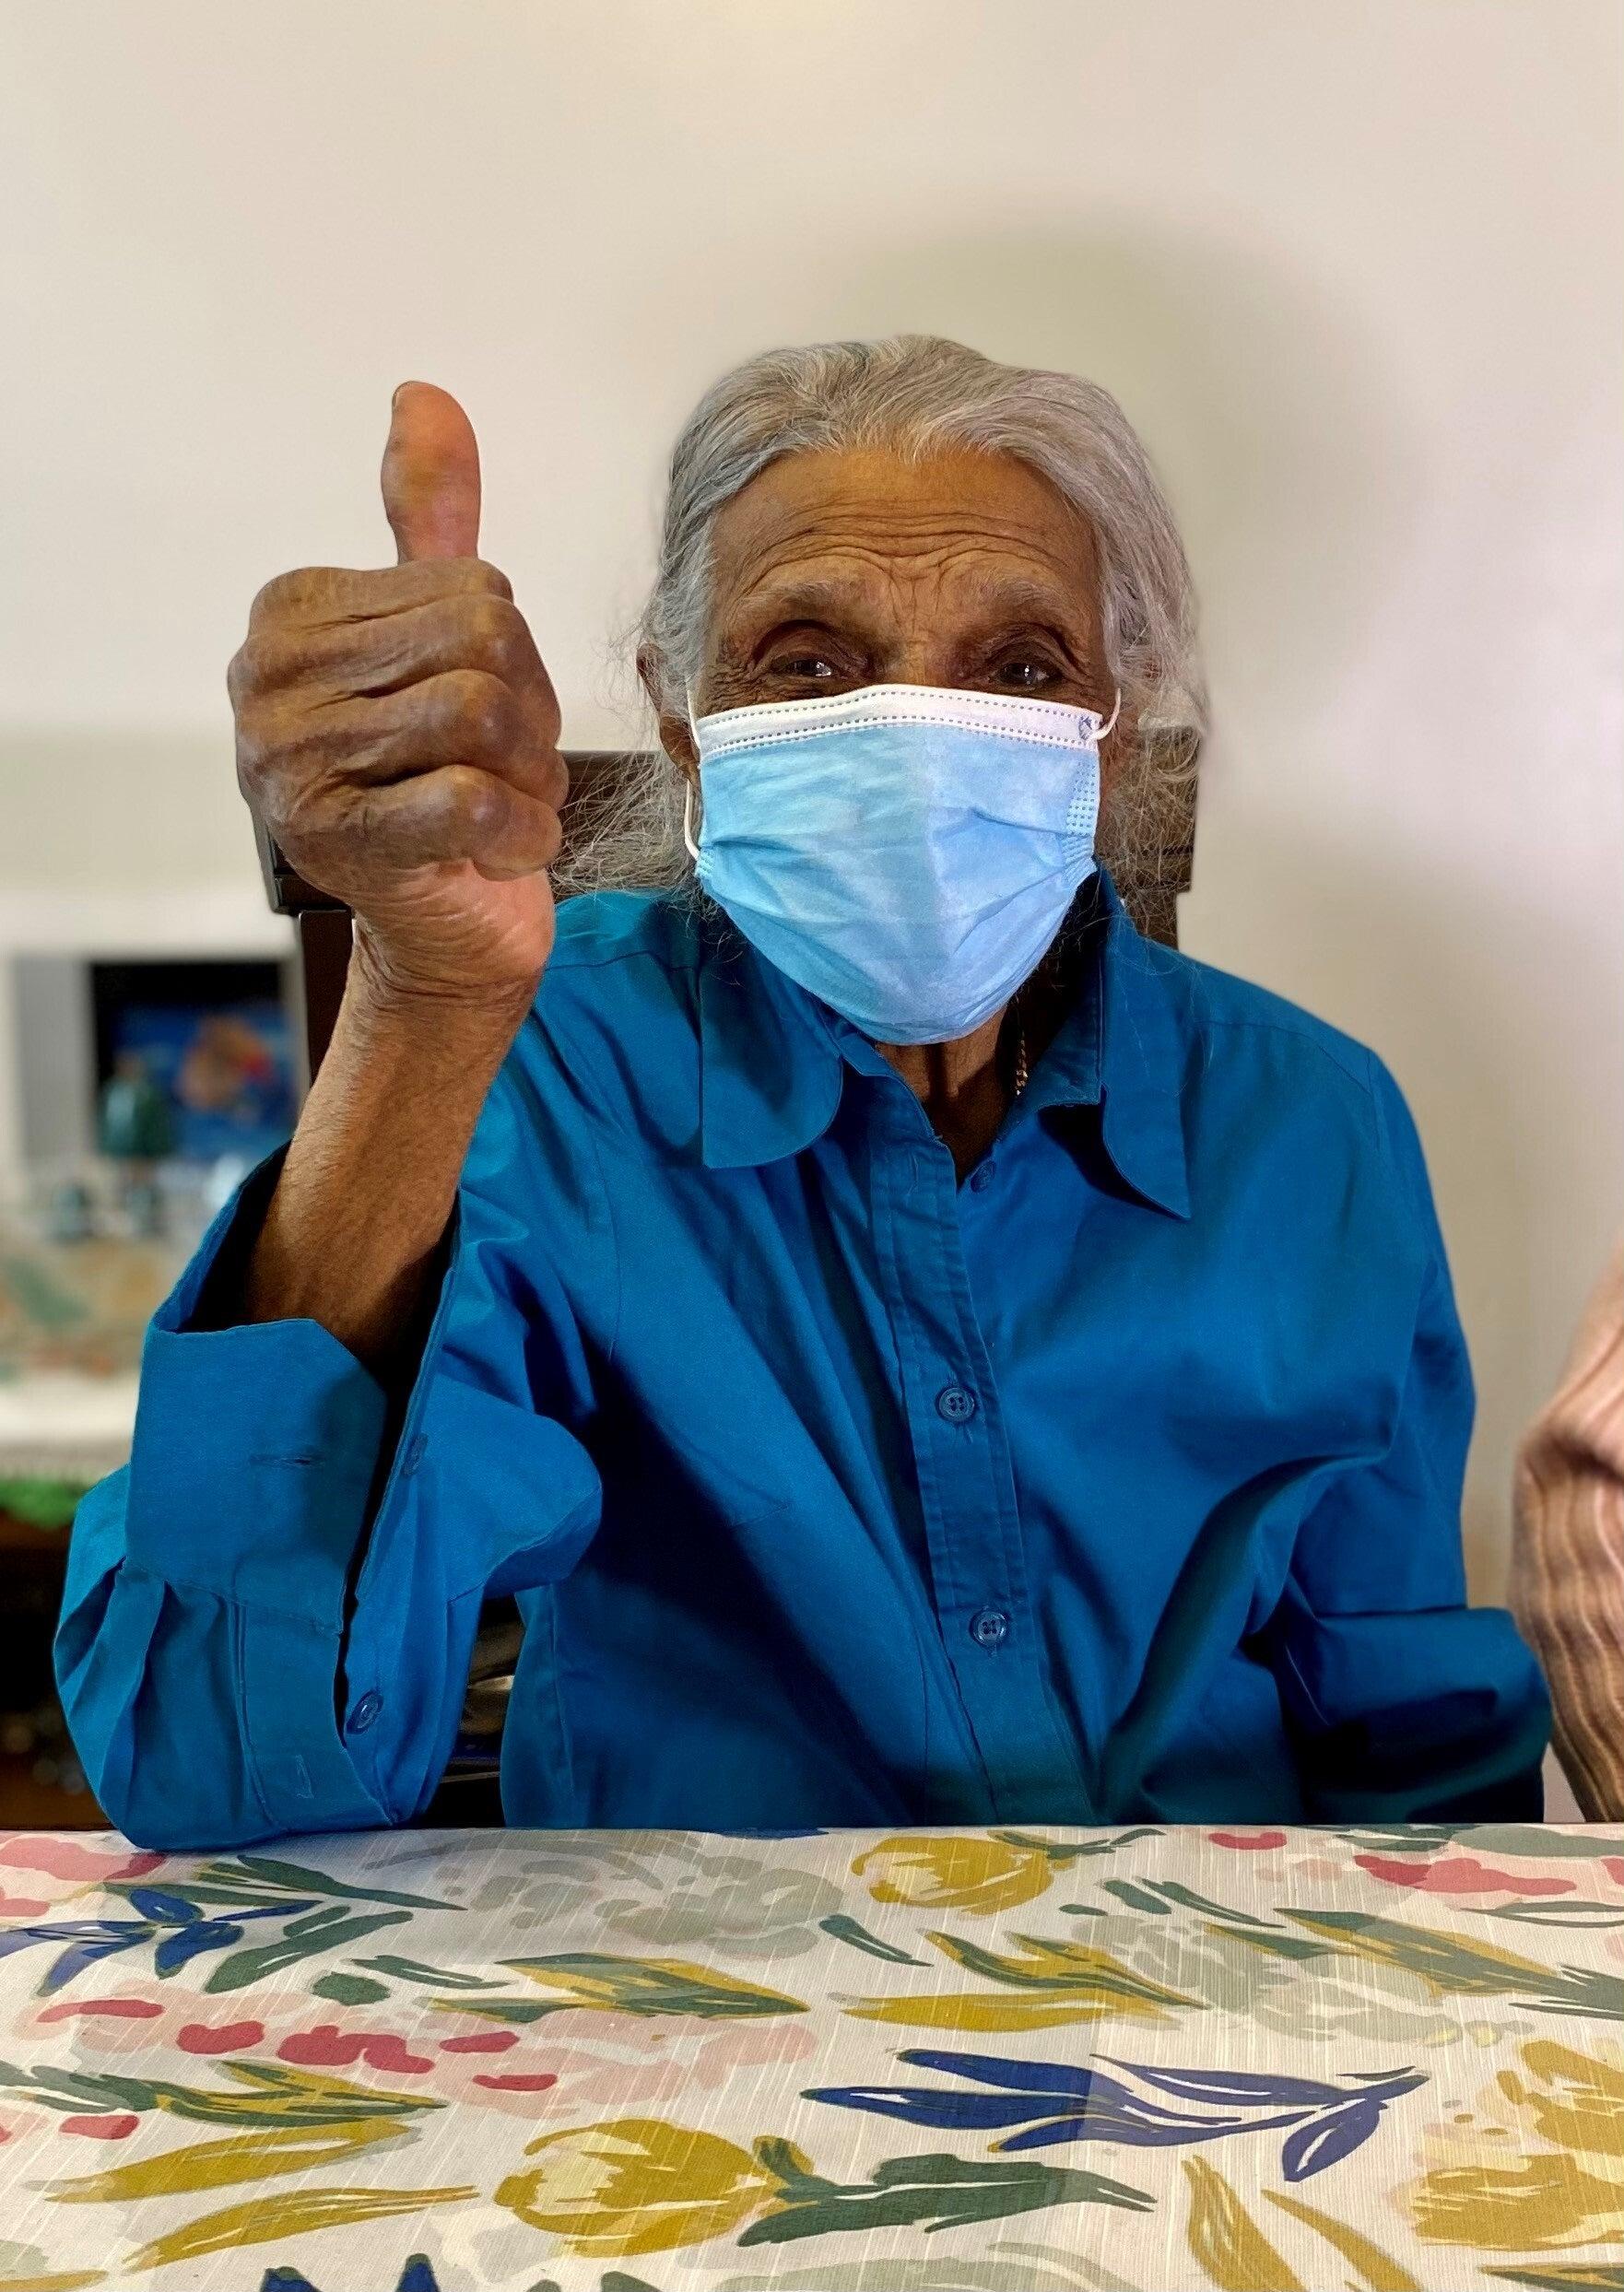 geriatrics home care patient getting the covid-19 vaccine